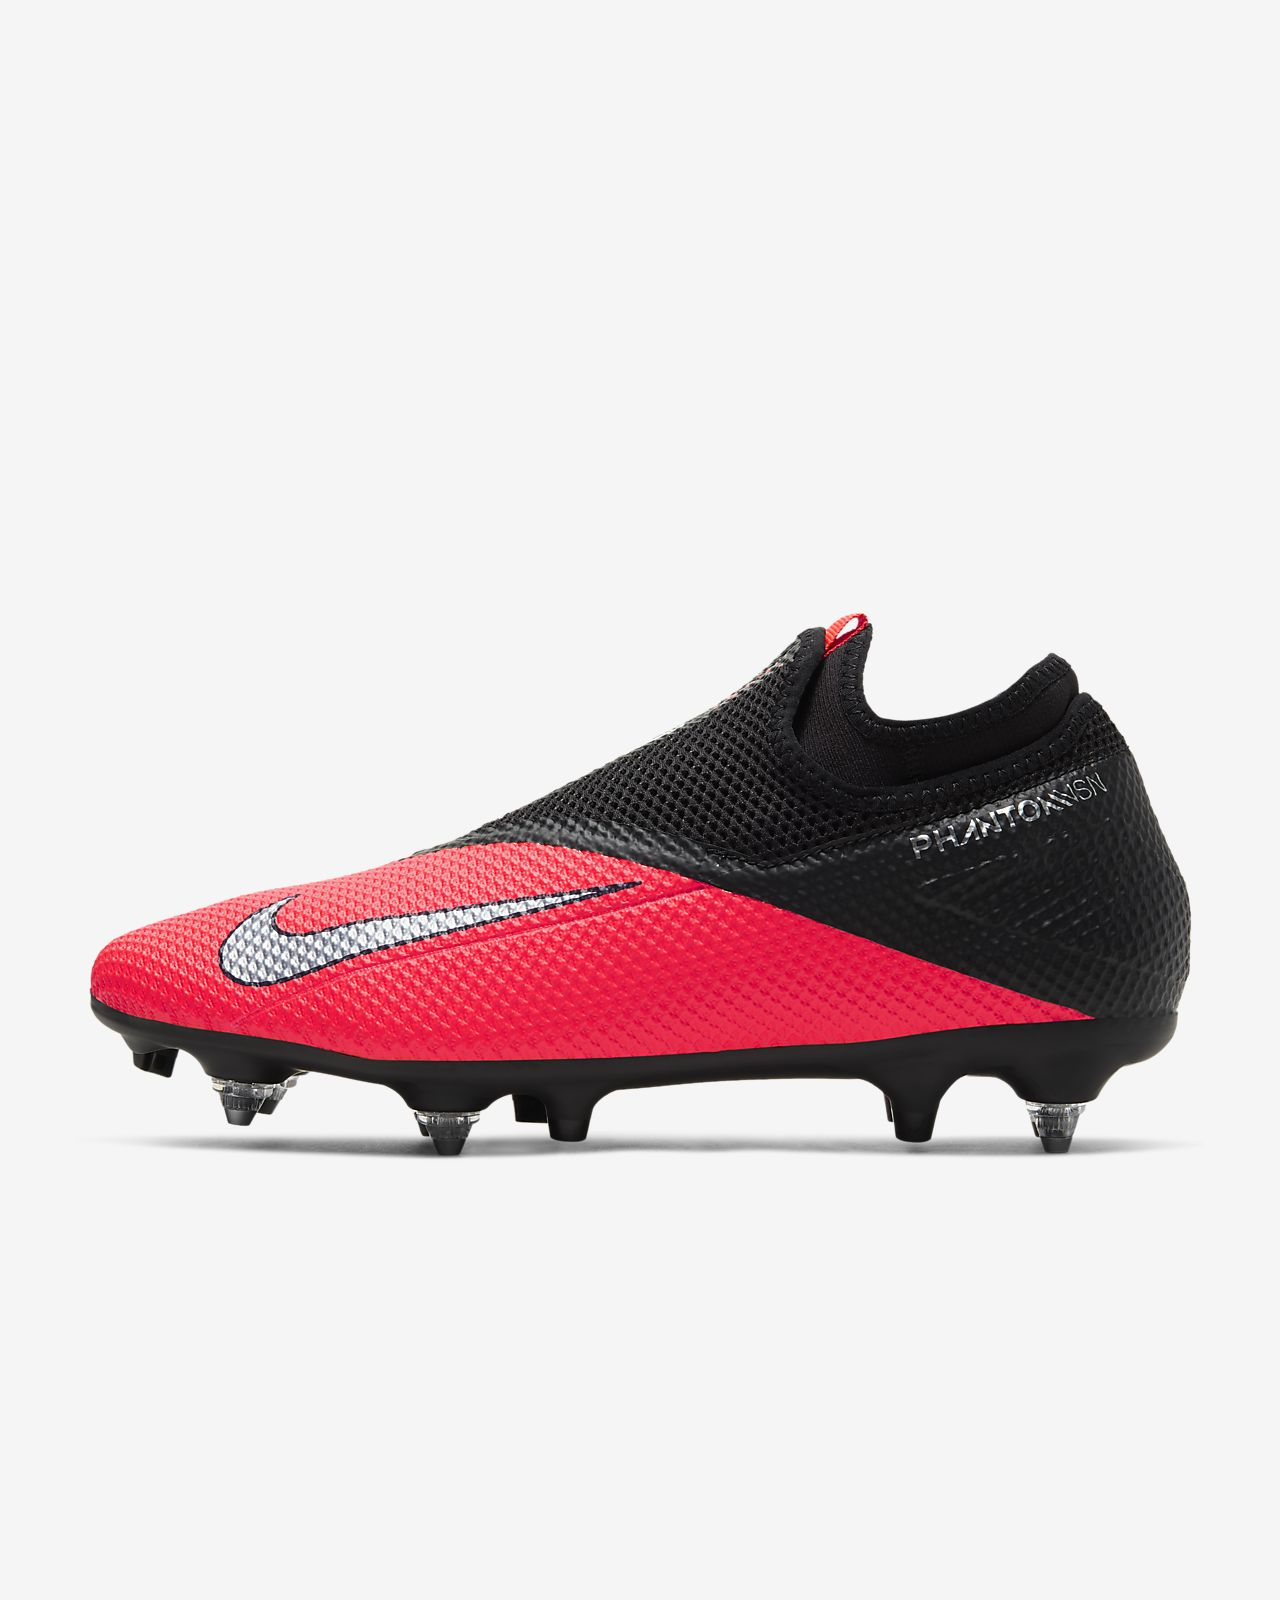 Chaussure de football à crampons pour terrain gras Nike Phantom Vision 2 Academy Dynamic Fit SG PRO Anti Clog Traction